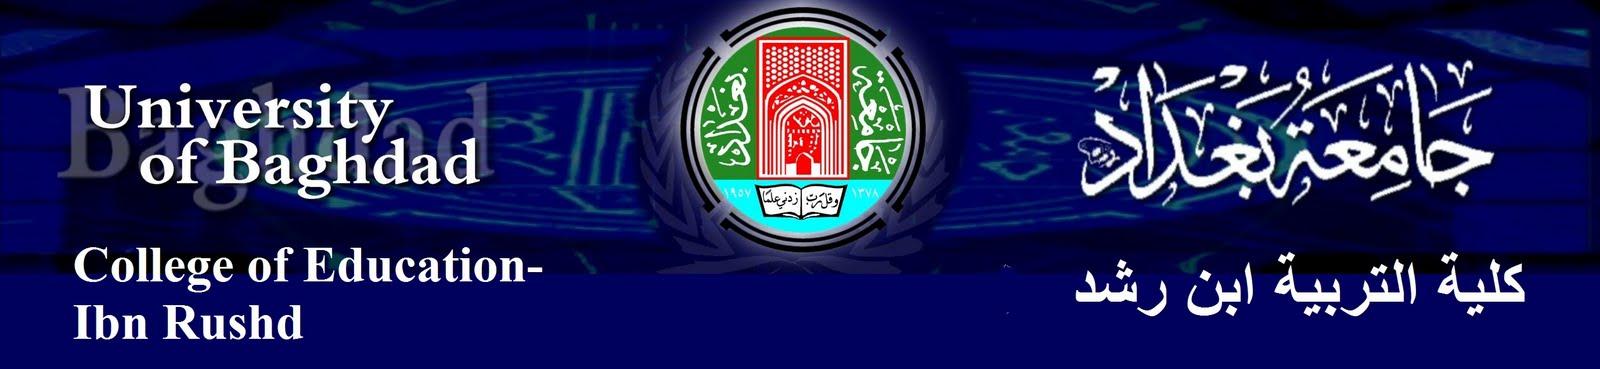 College of Education-IbnRushd/ كلية التربية ابن رشد